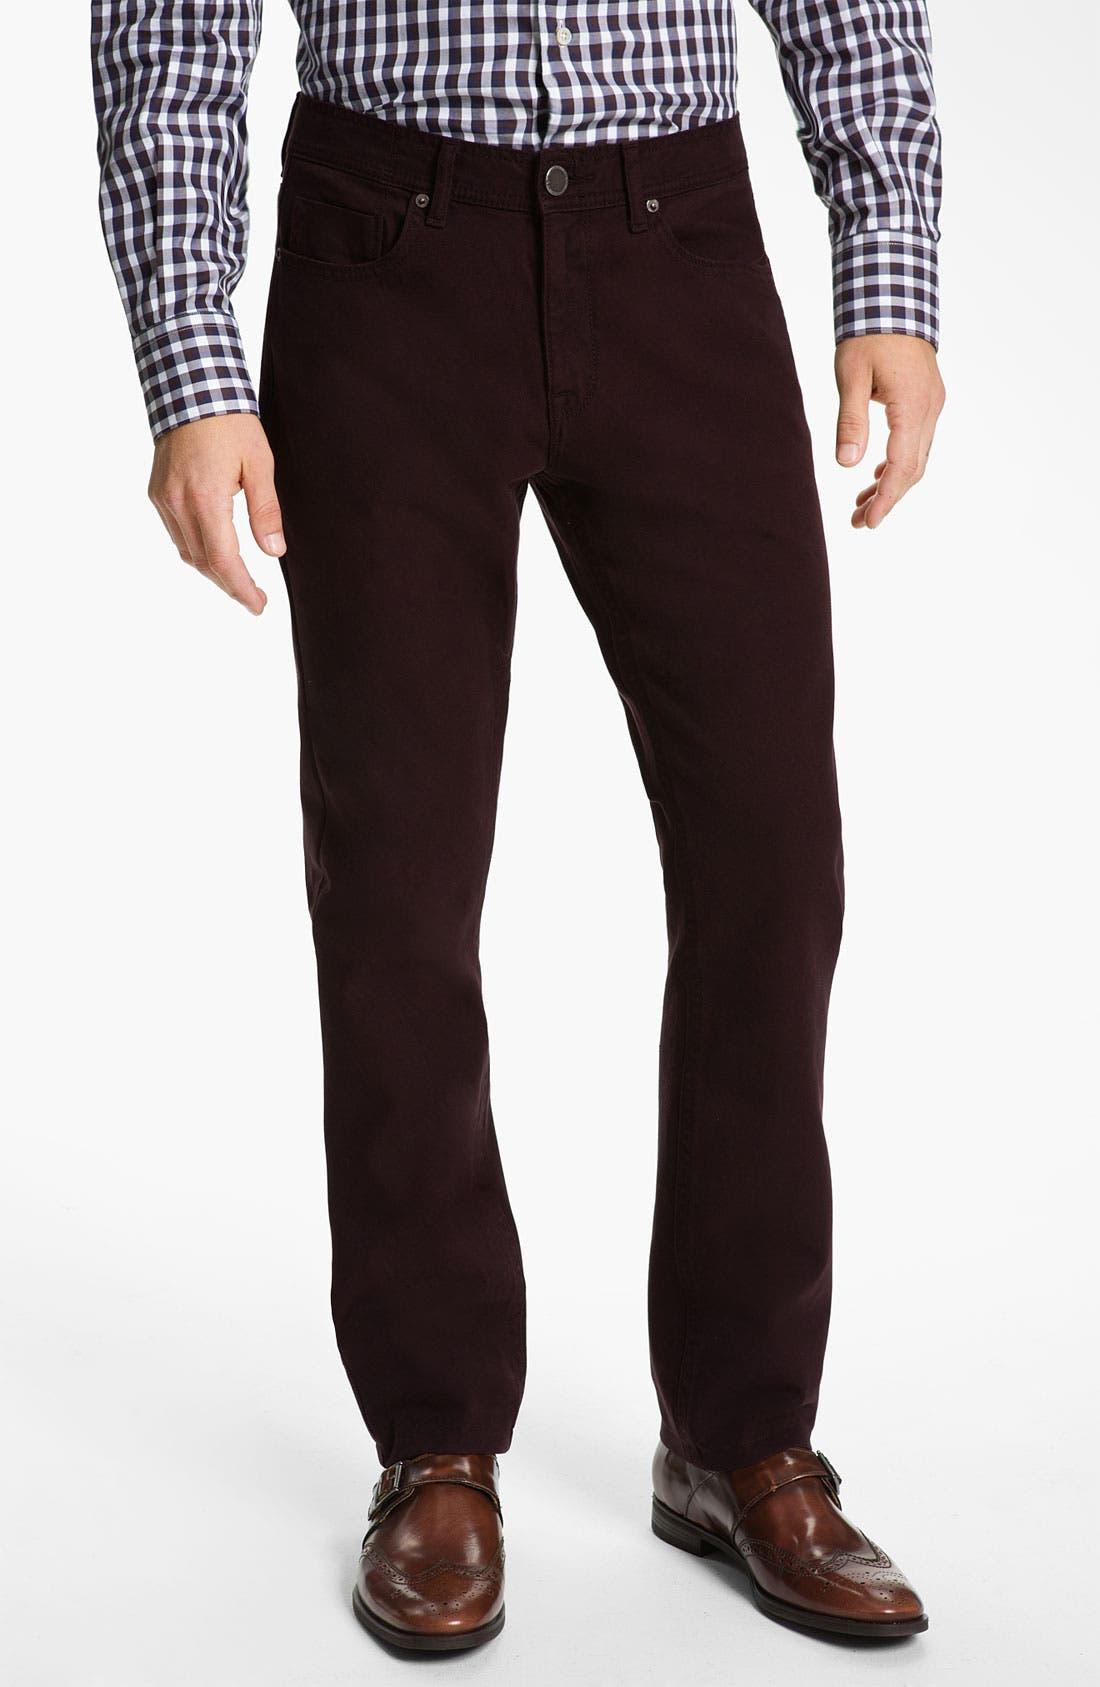 Main Image - DL1961 'Vince' Straight Leg Jeans (Redwood) (Online Only)